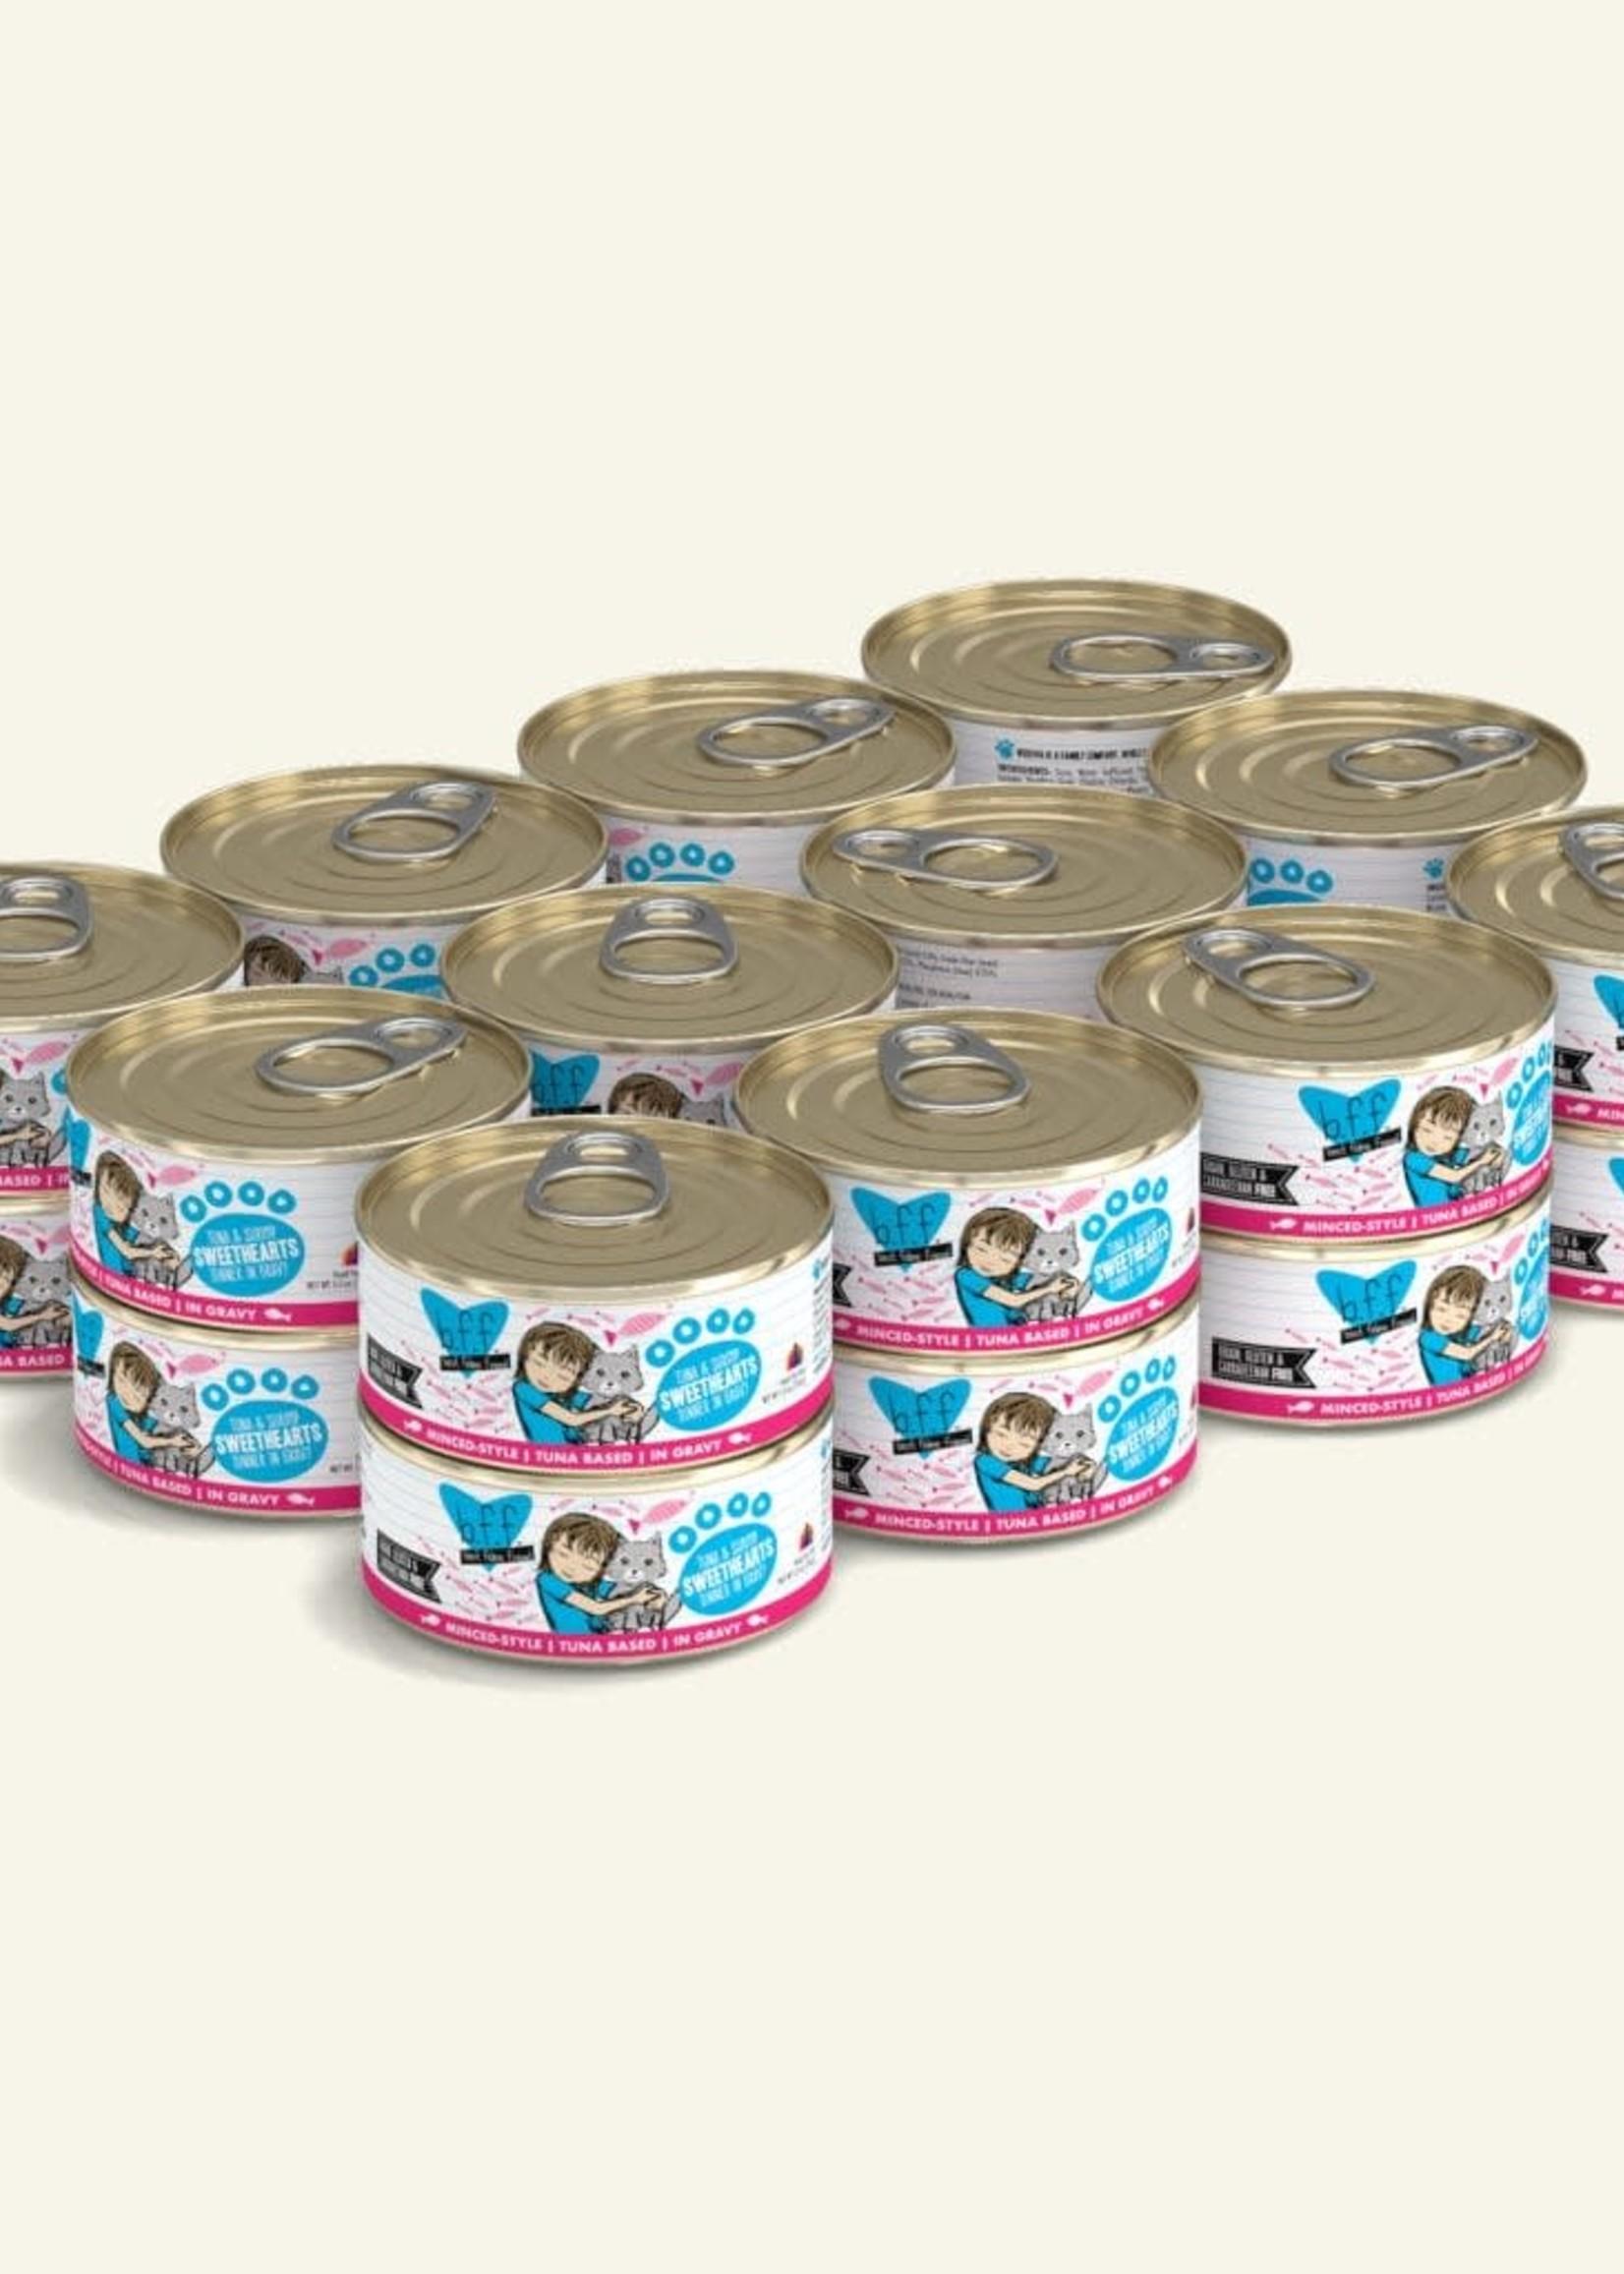 Weruva B.F.F. Tuna & Shrimp Sweethearts 5.5oz Can Wet Cat Food (Pack of 24)